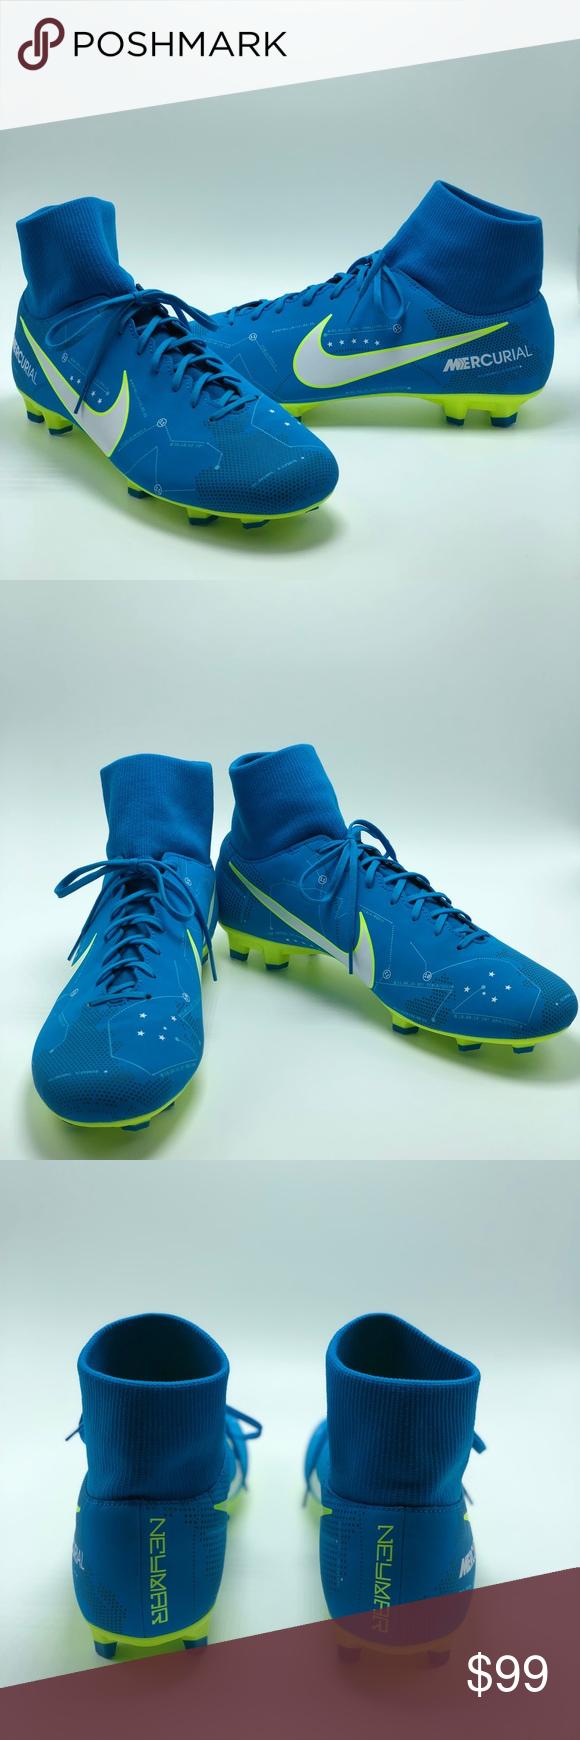 wholesale dealer e8b76 3001d Nike Mercurial Victory IV DF NJR FG Neymar Cleats ...